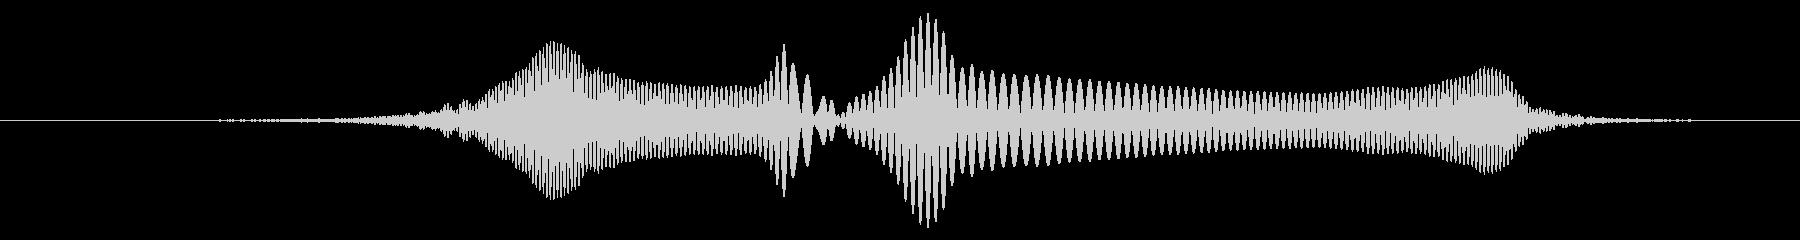 SF、機械的な効果音の未再生の波形